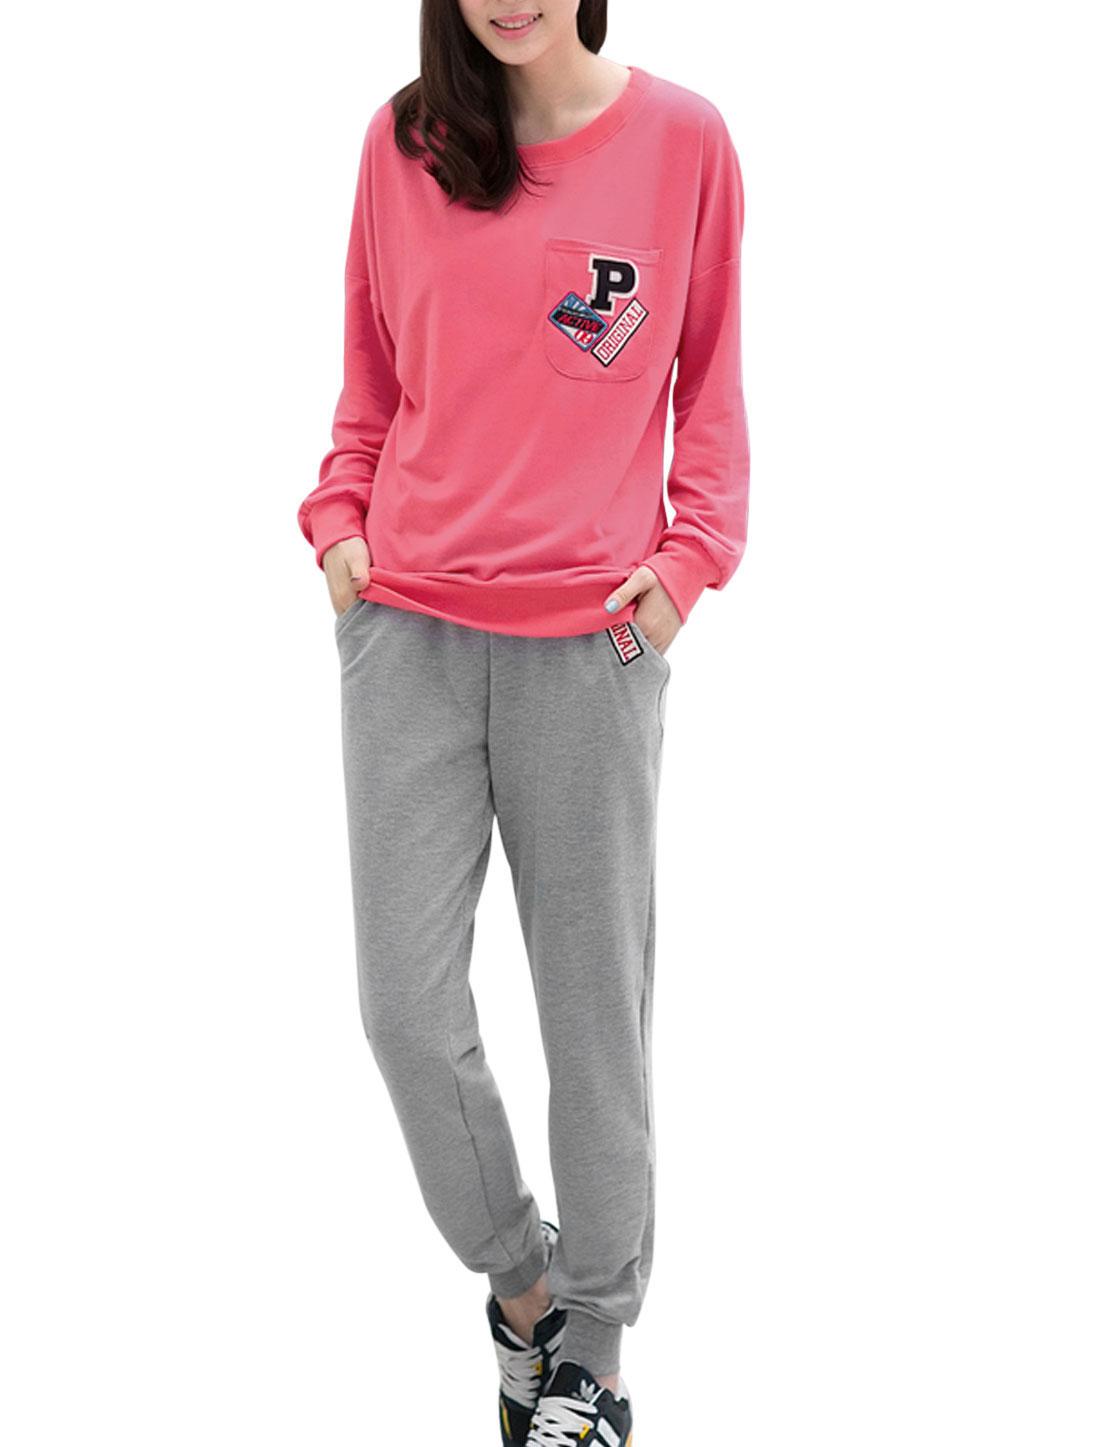 Lady Bat Sleeve Fuchsia T-Shirt w Sport Gray Pants XL